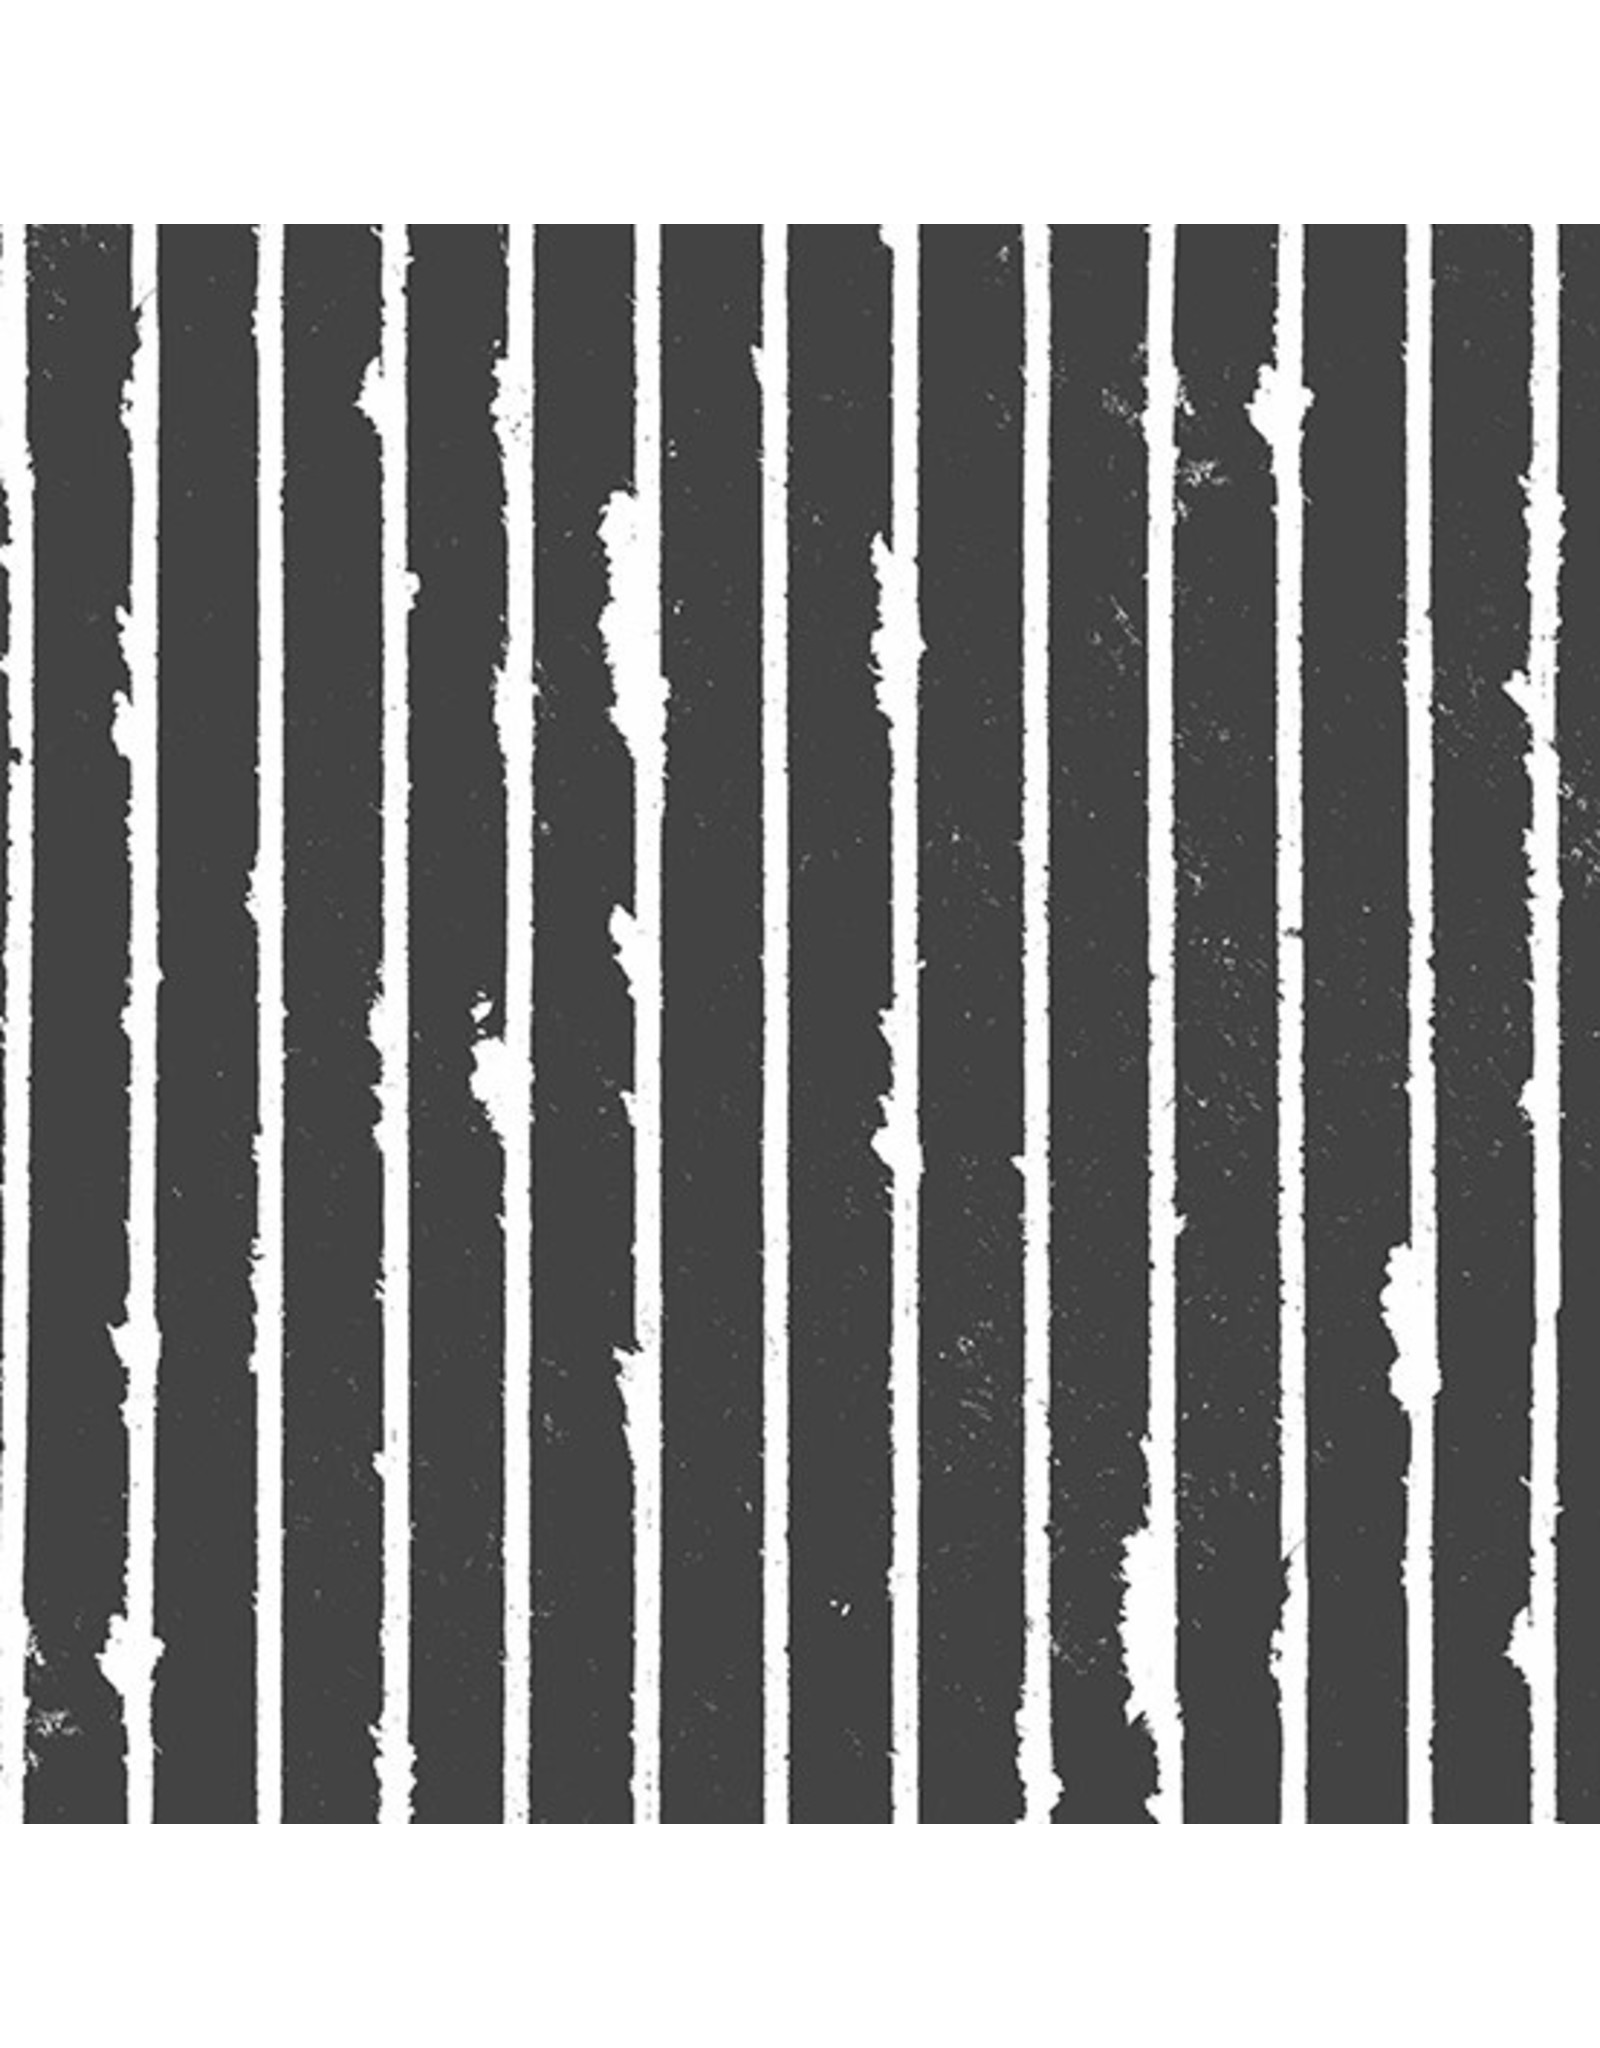 Andover Prism - Striped Shale